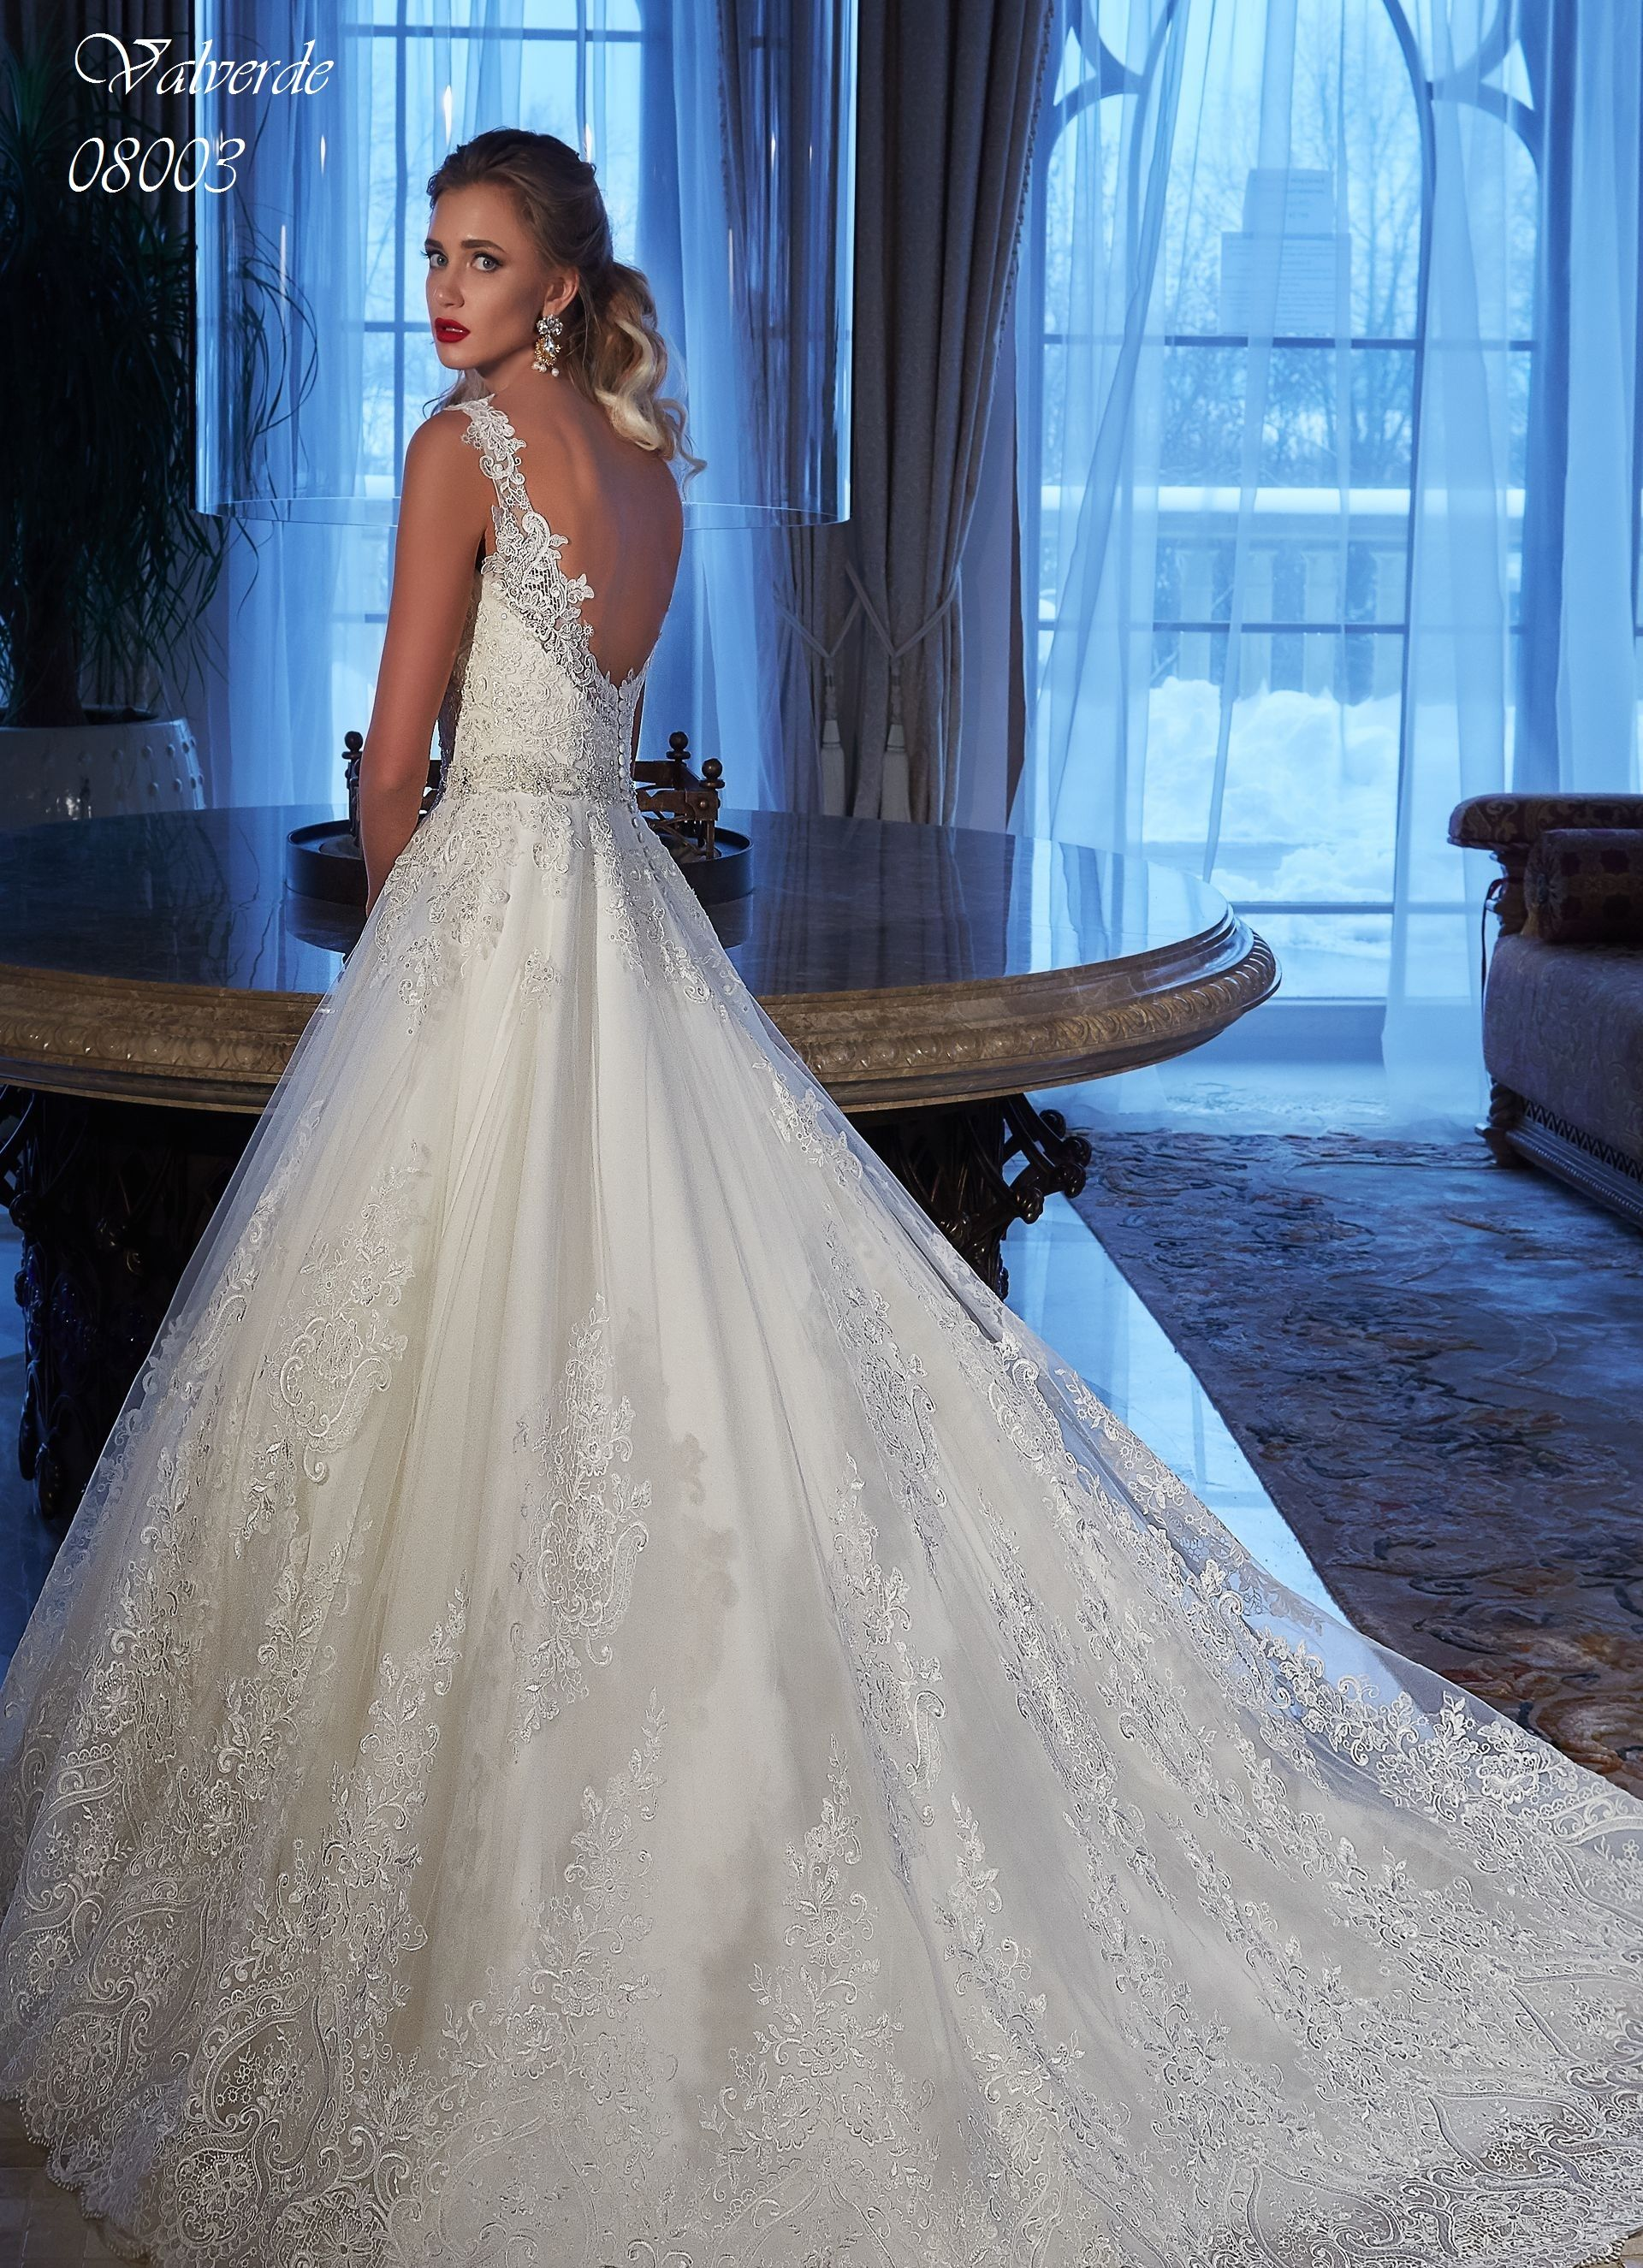 Valverde (08003) Sold Exclusively at Bridal Room in Pretoria ...